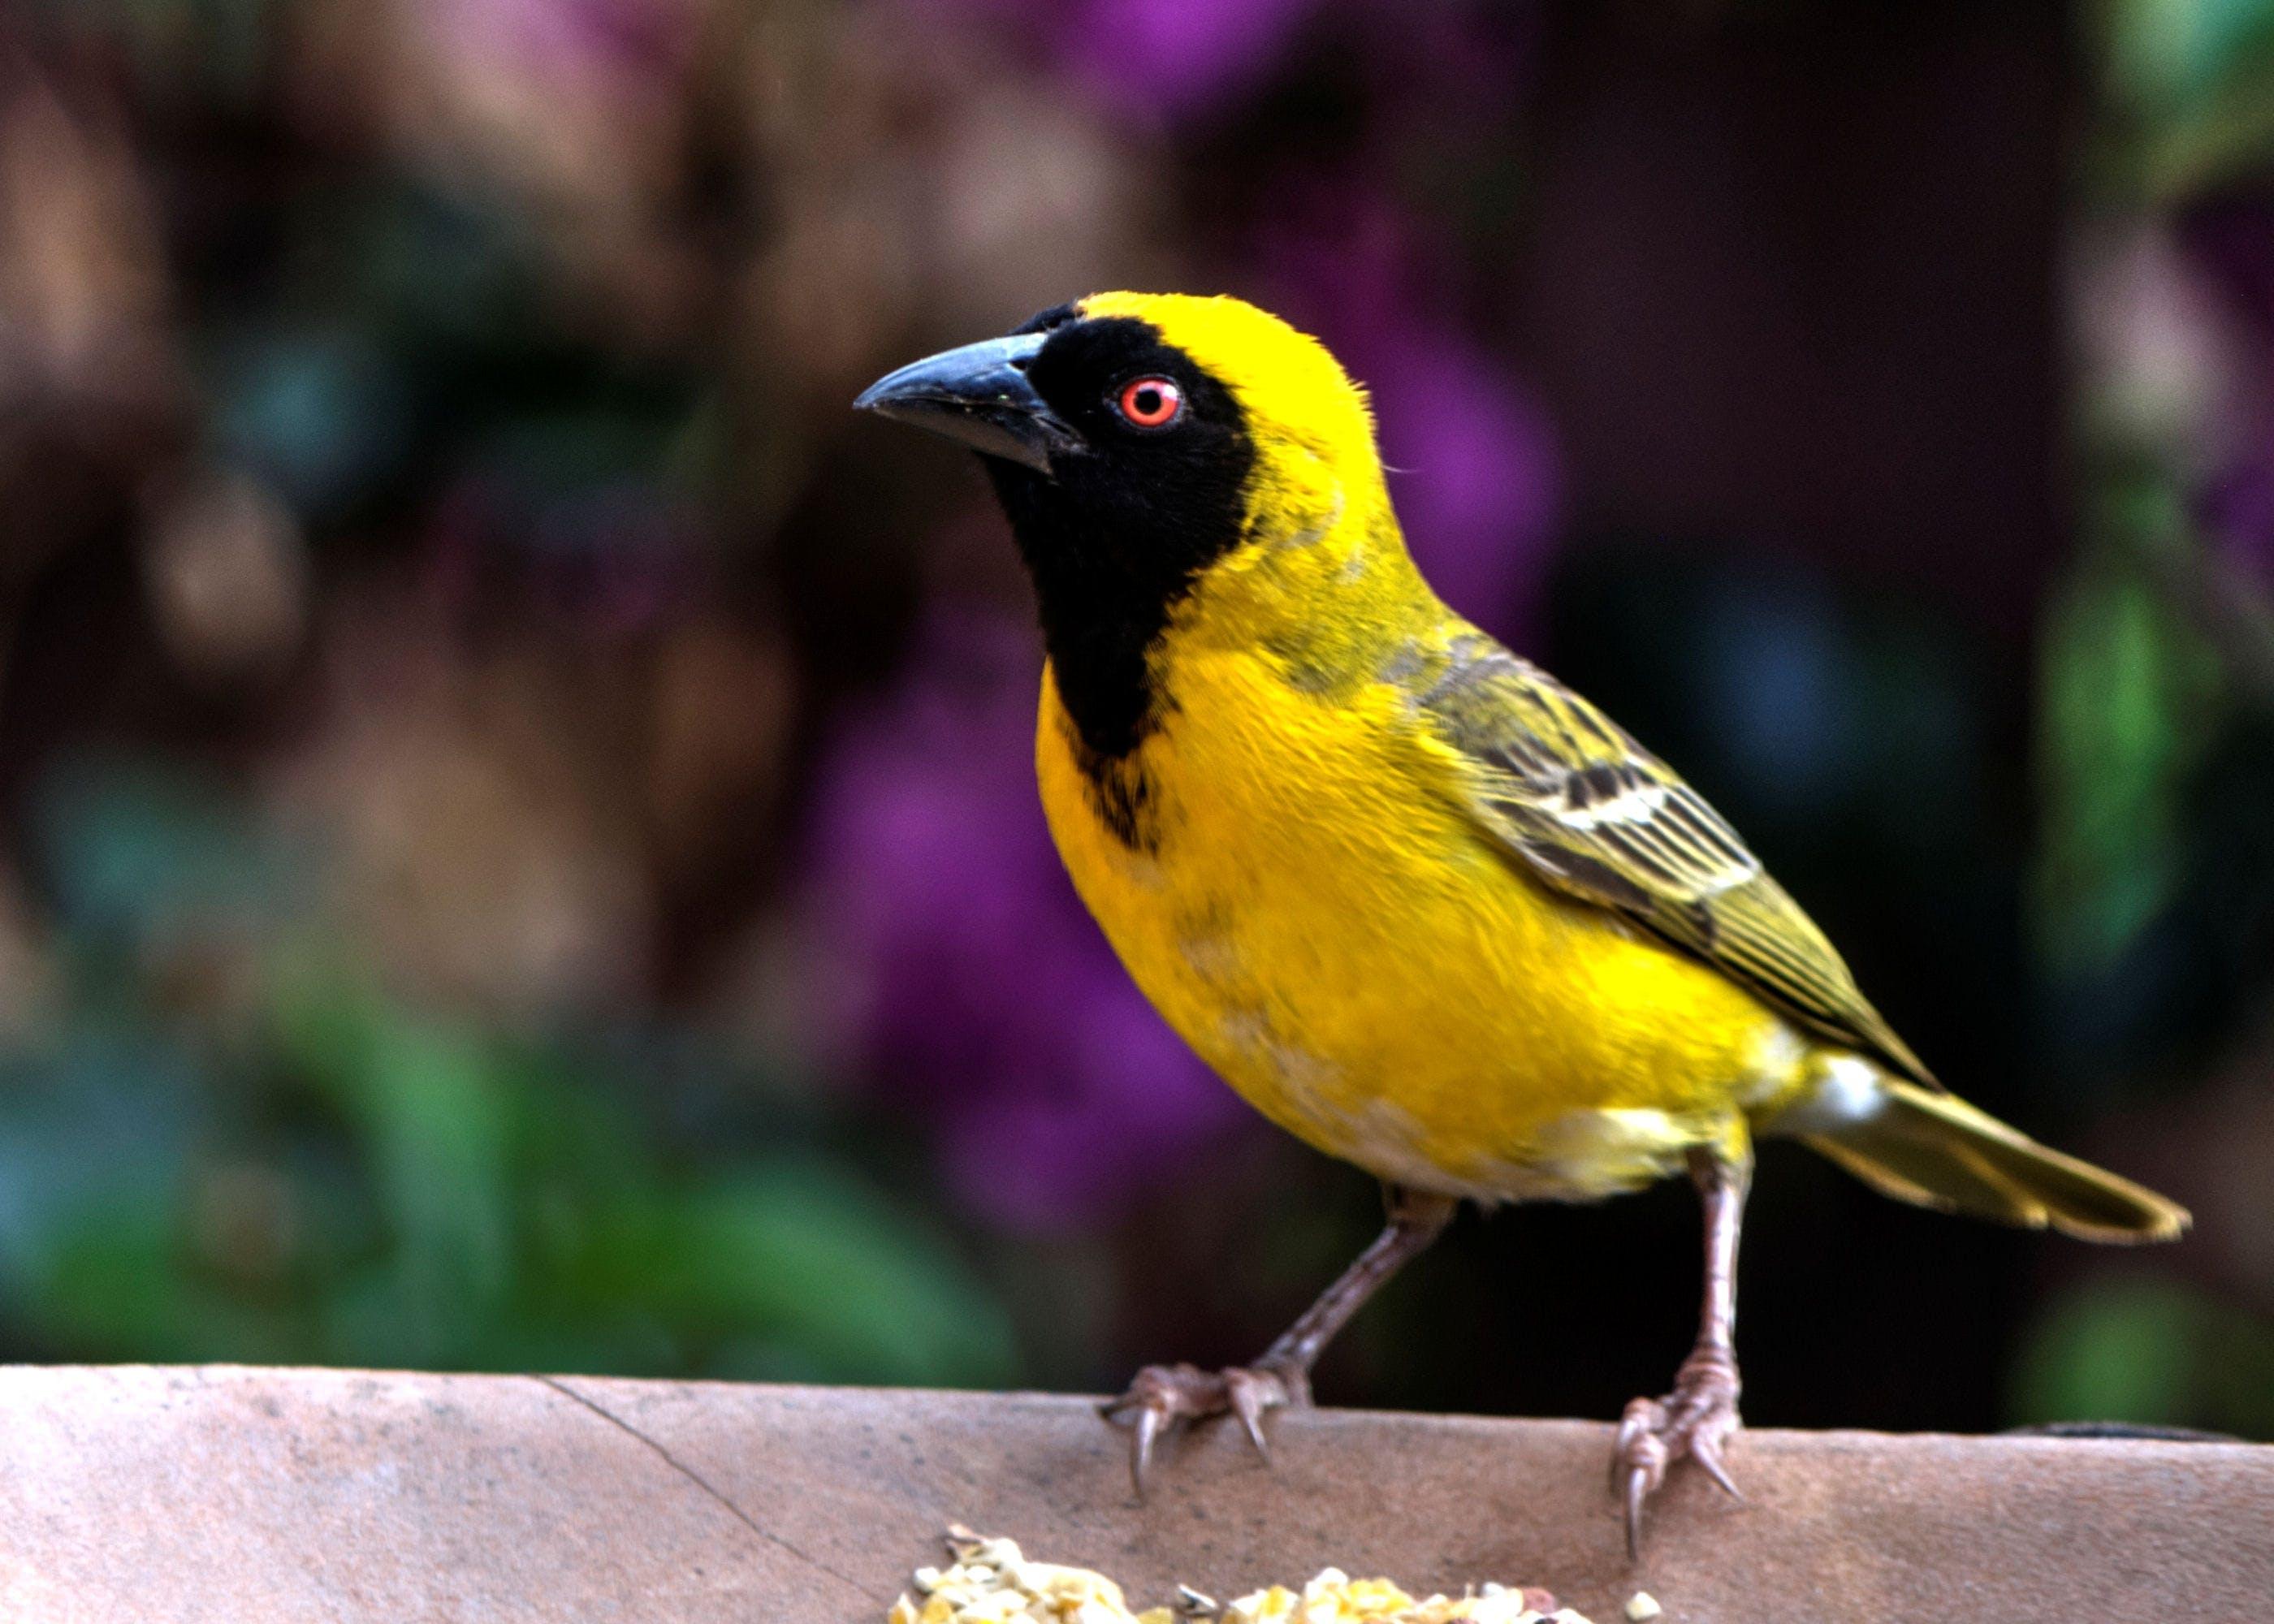 Free stock photo of nature, bird, summer, animal